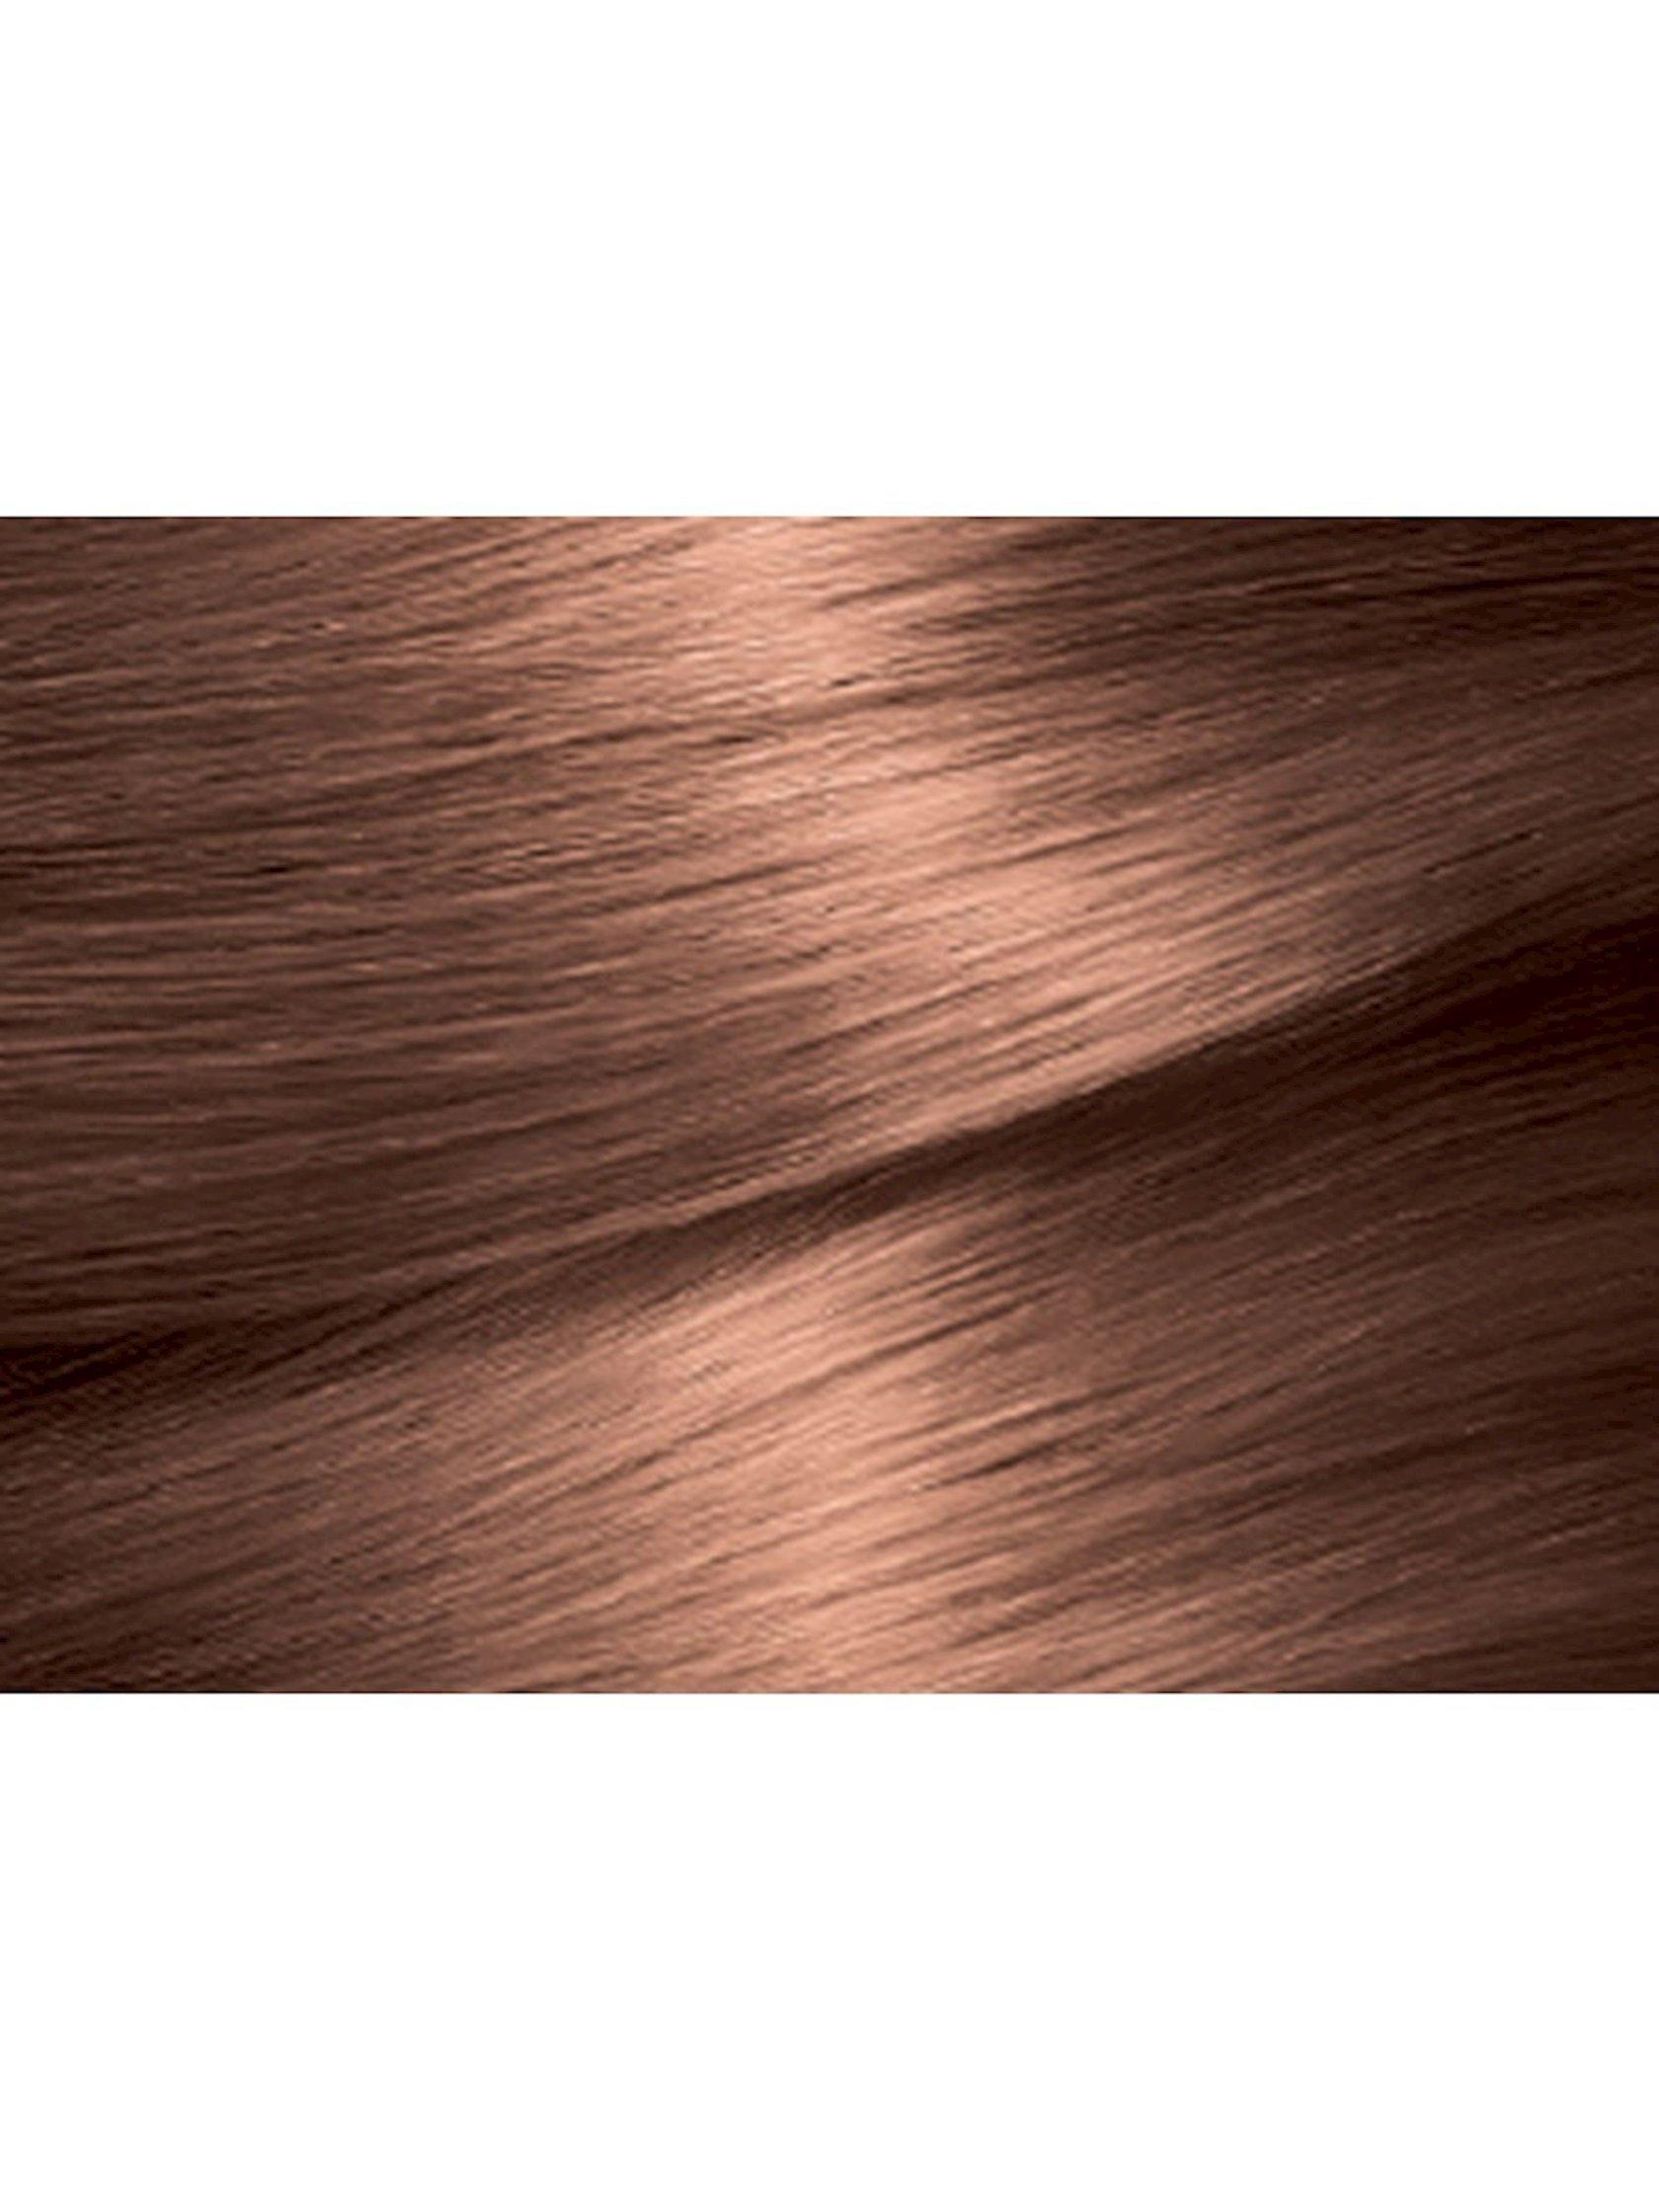 Saç üçün qalıcı krem-boya Garnier Color Naturals 6.25 Şokolad